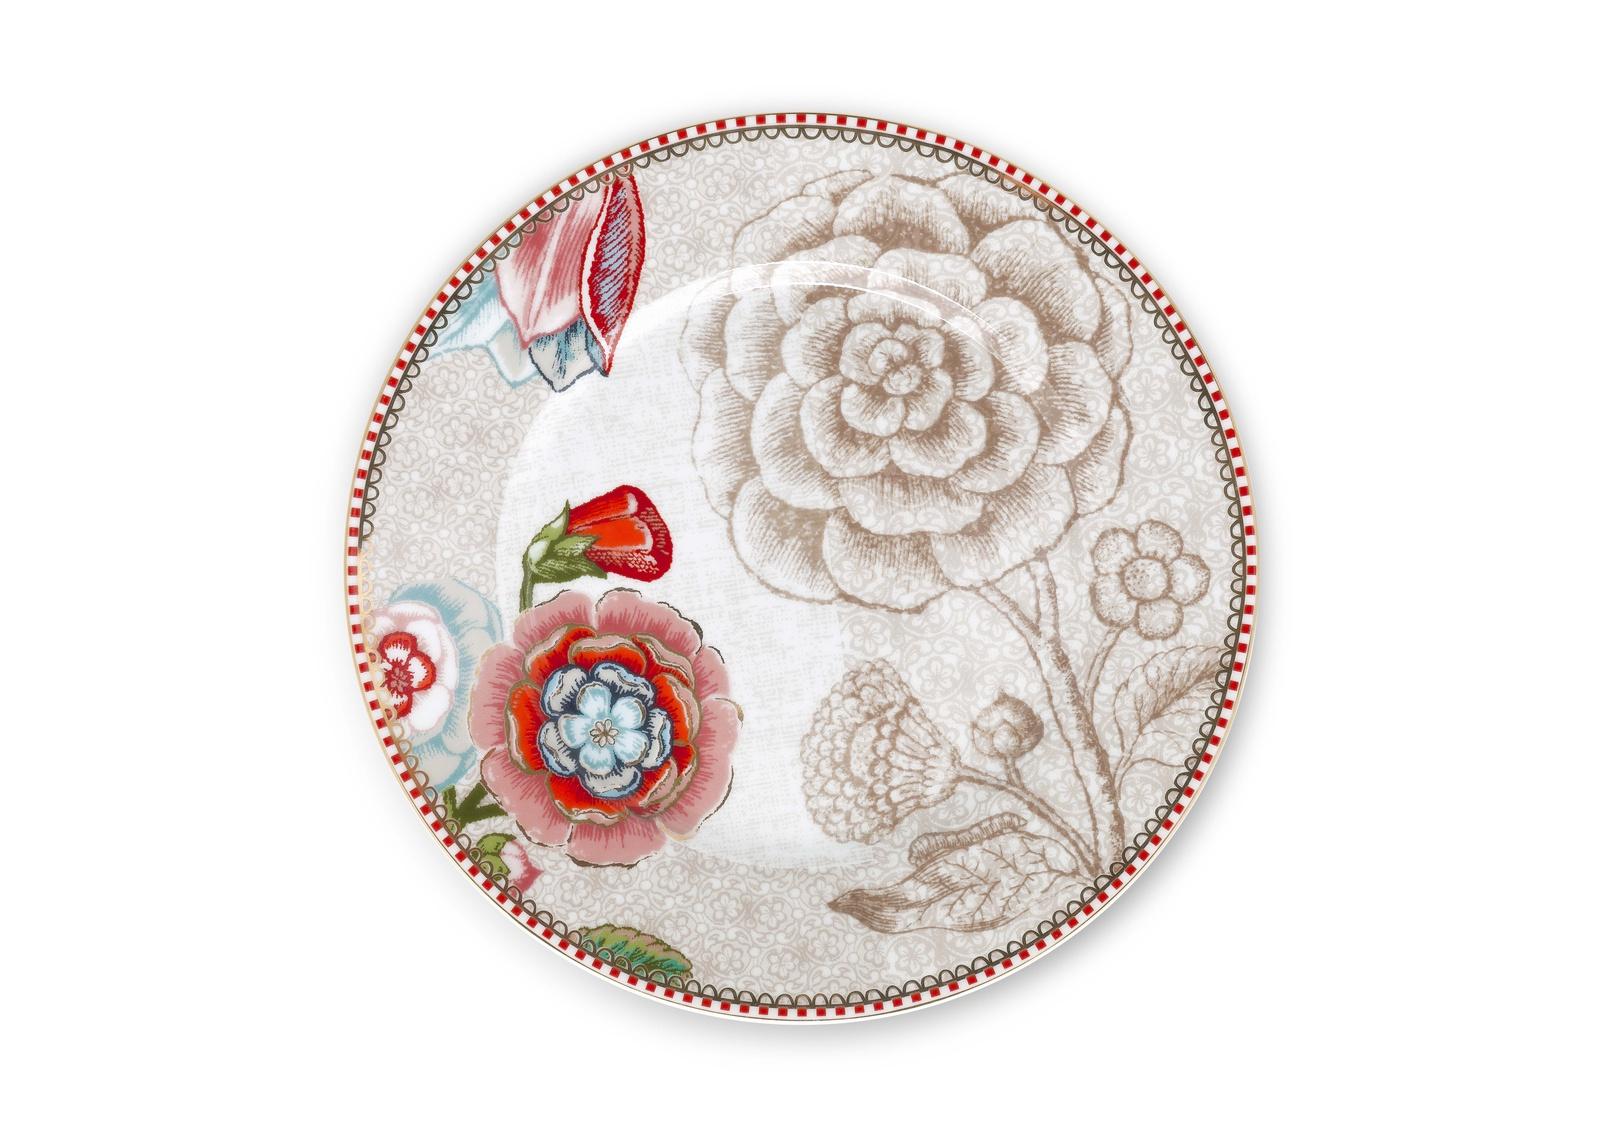 Тарелка PiP Studio Floral, 51.001.155, диаметр 17 см, 2 шт тарелка псковский гончар орнамент цвет бежевый диаметр 20 см